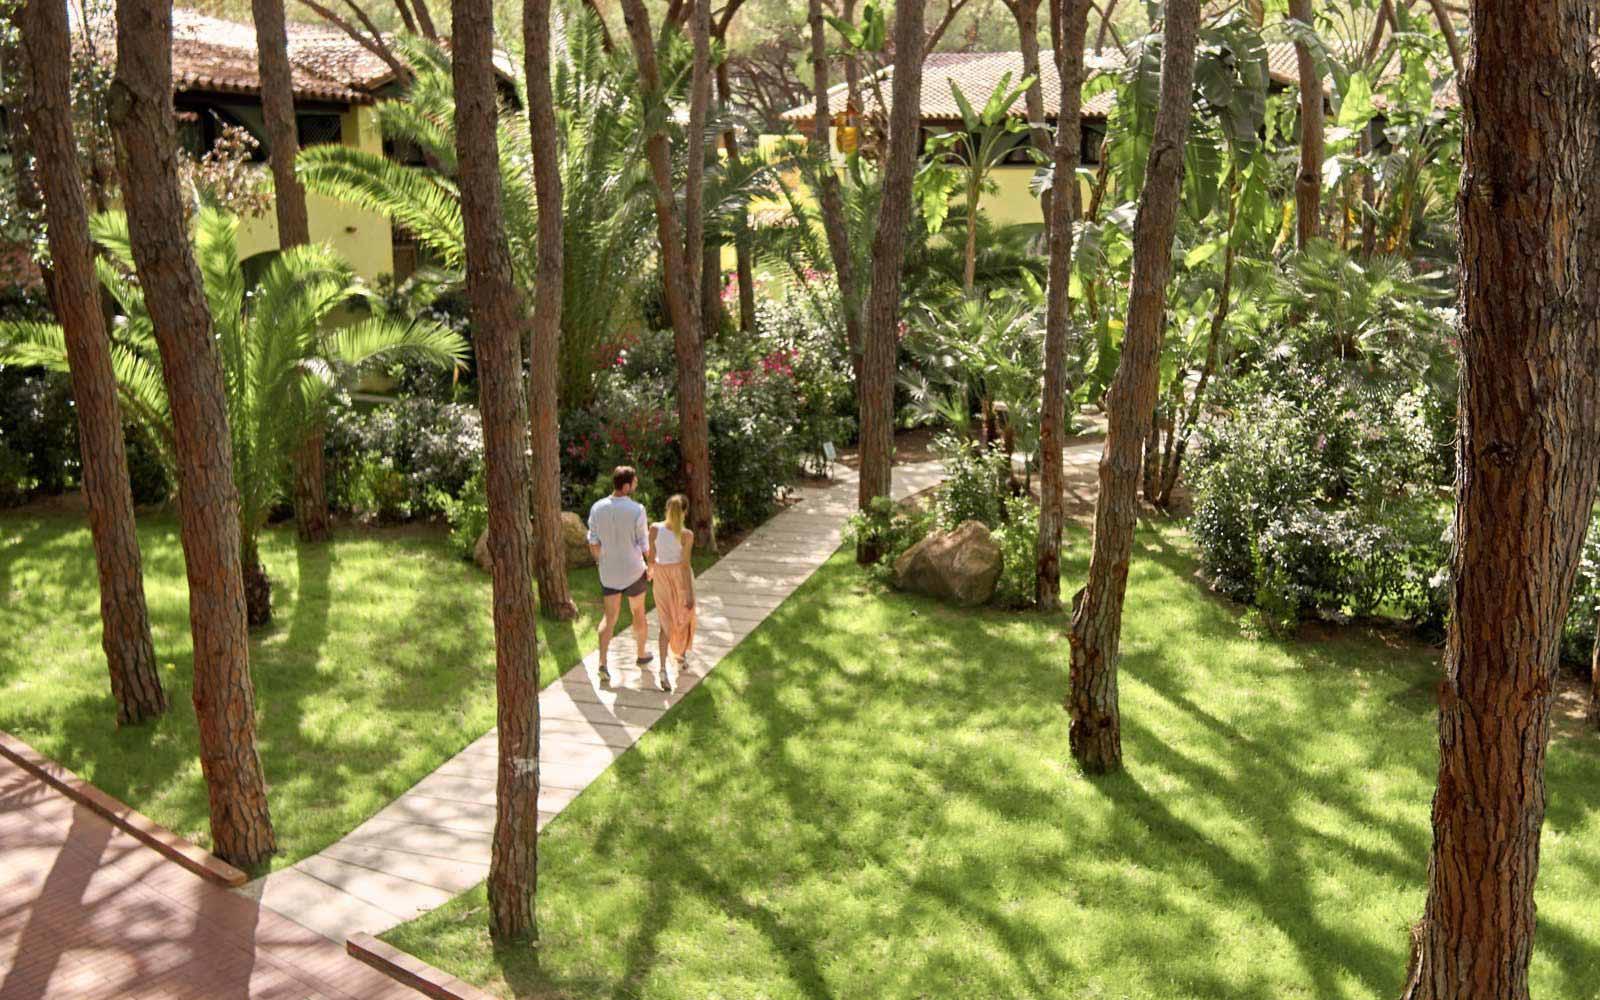 Hotel Pineta gardens at Forte Village Resort